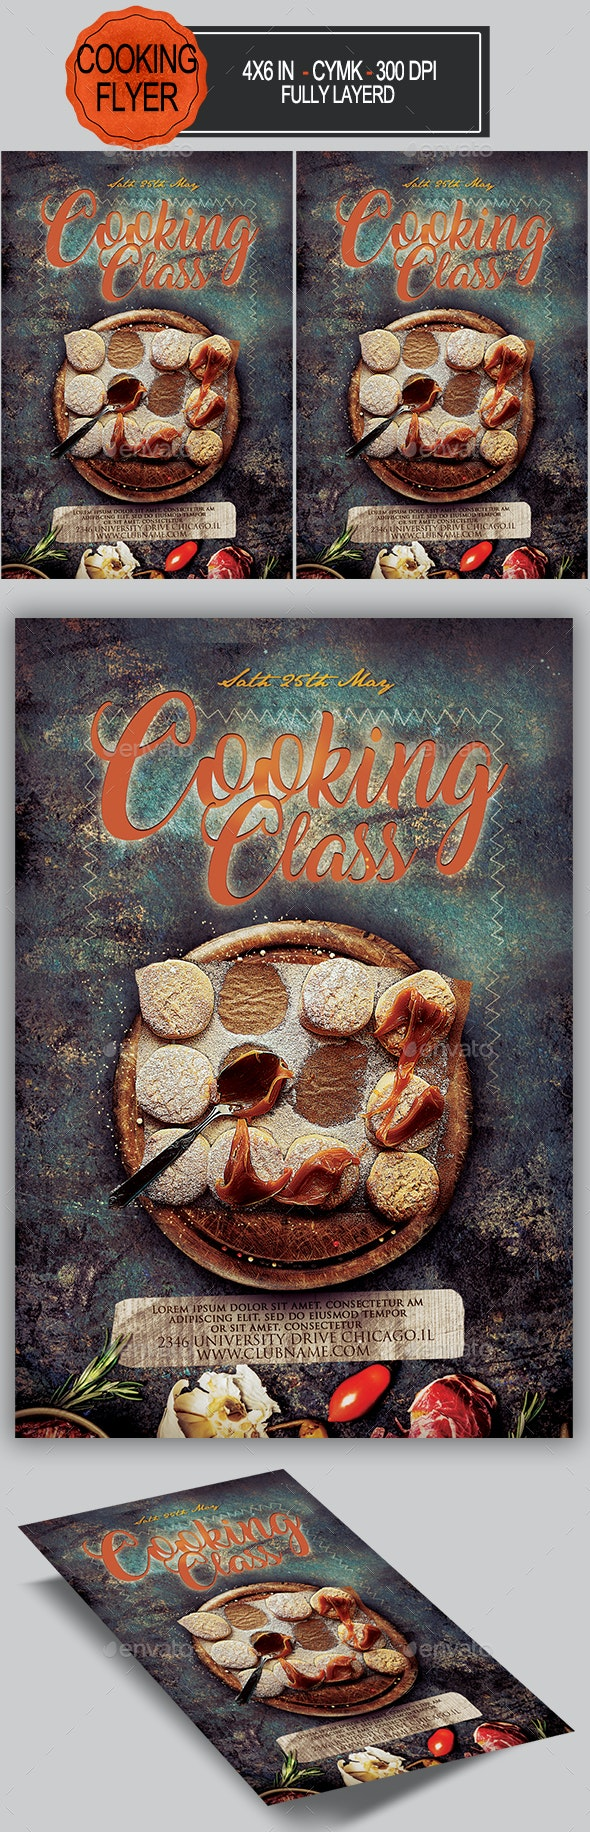 Cooking Classes Flyer - Restaurant Flyers